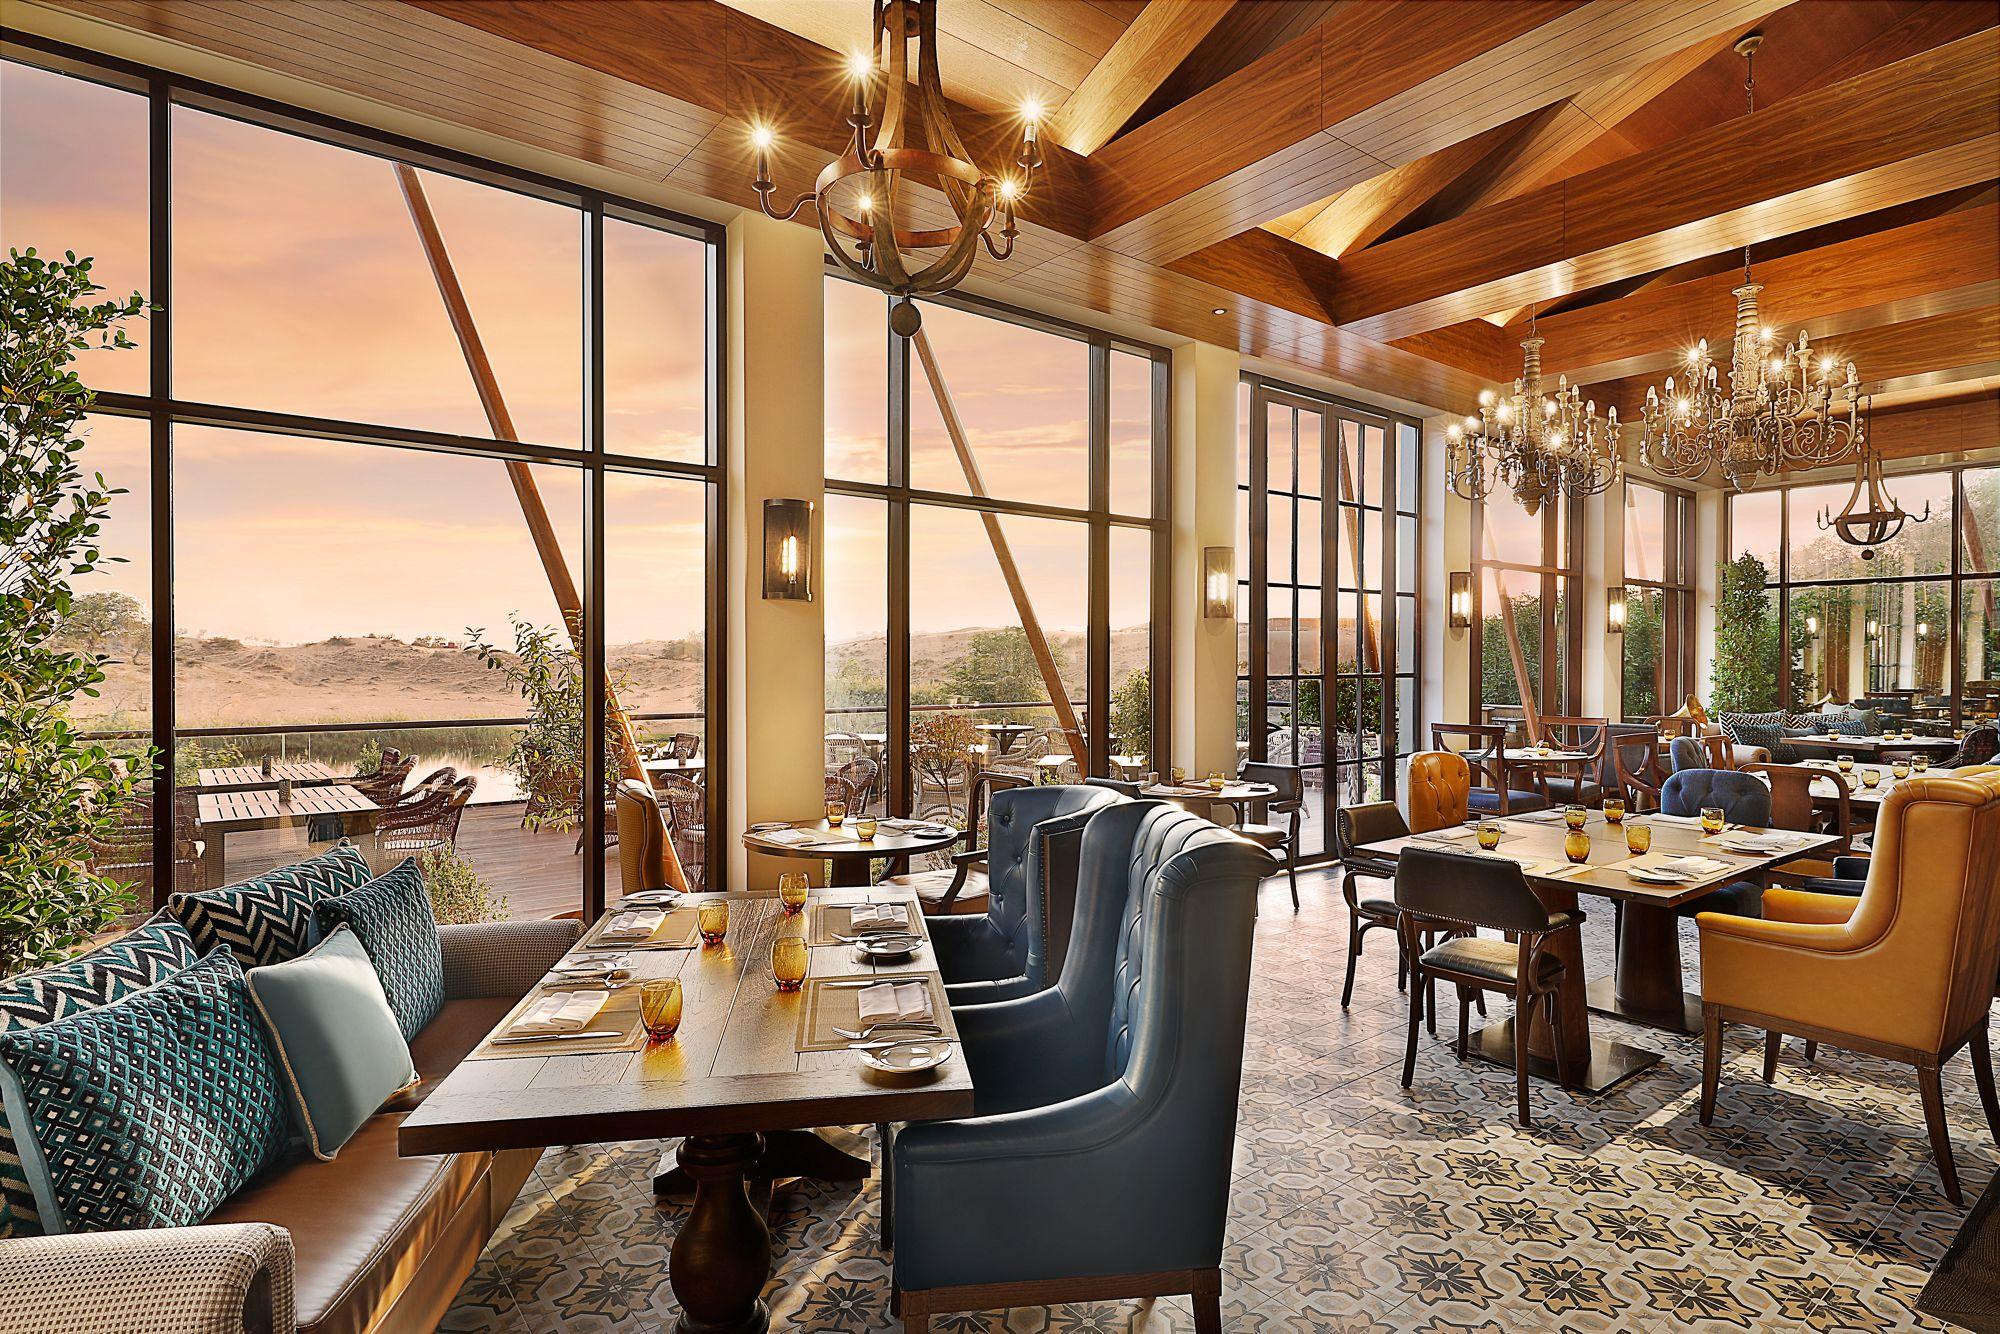 ritz-carlton-al-wadi-lounge